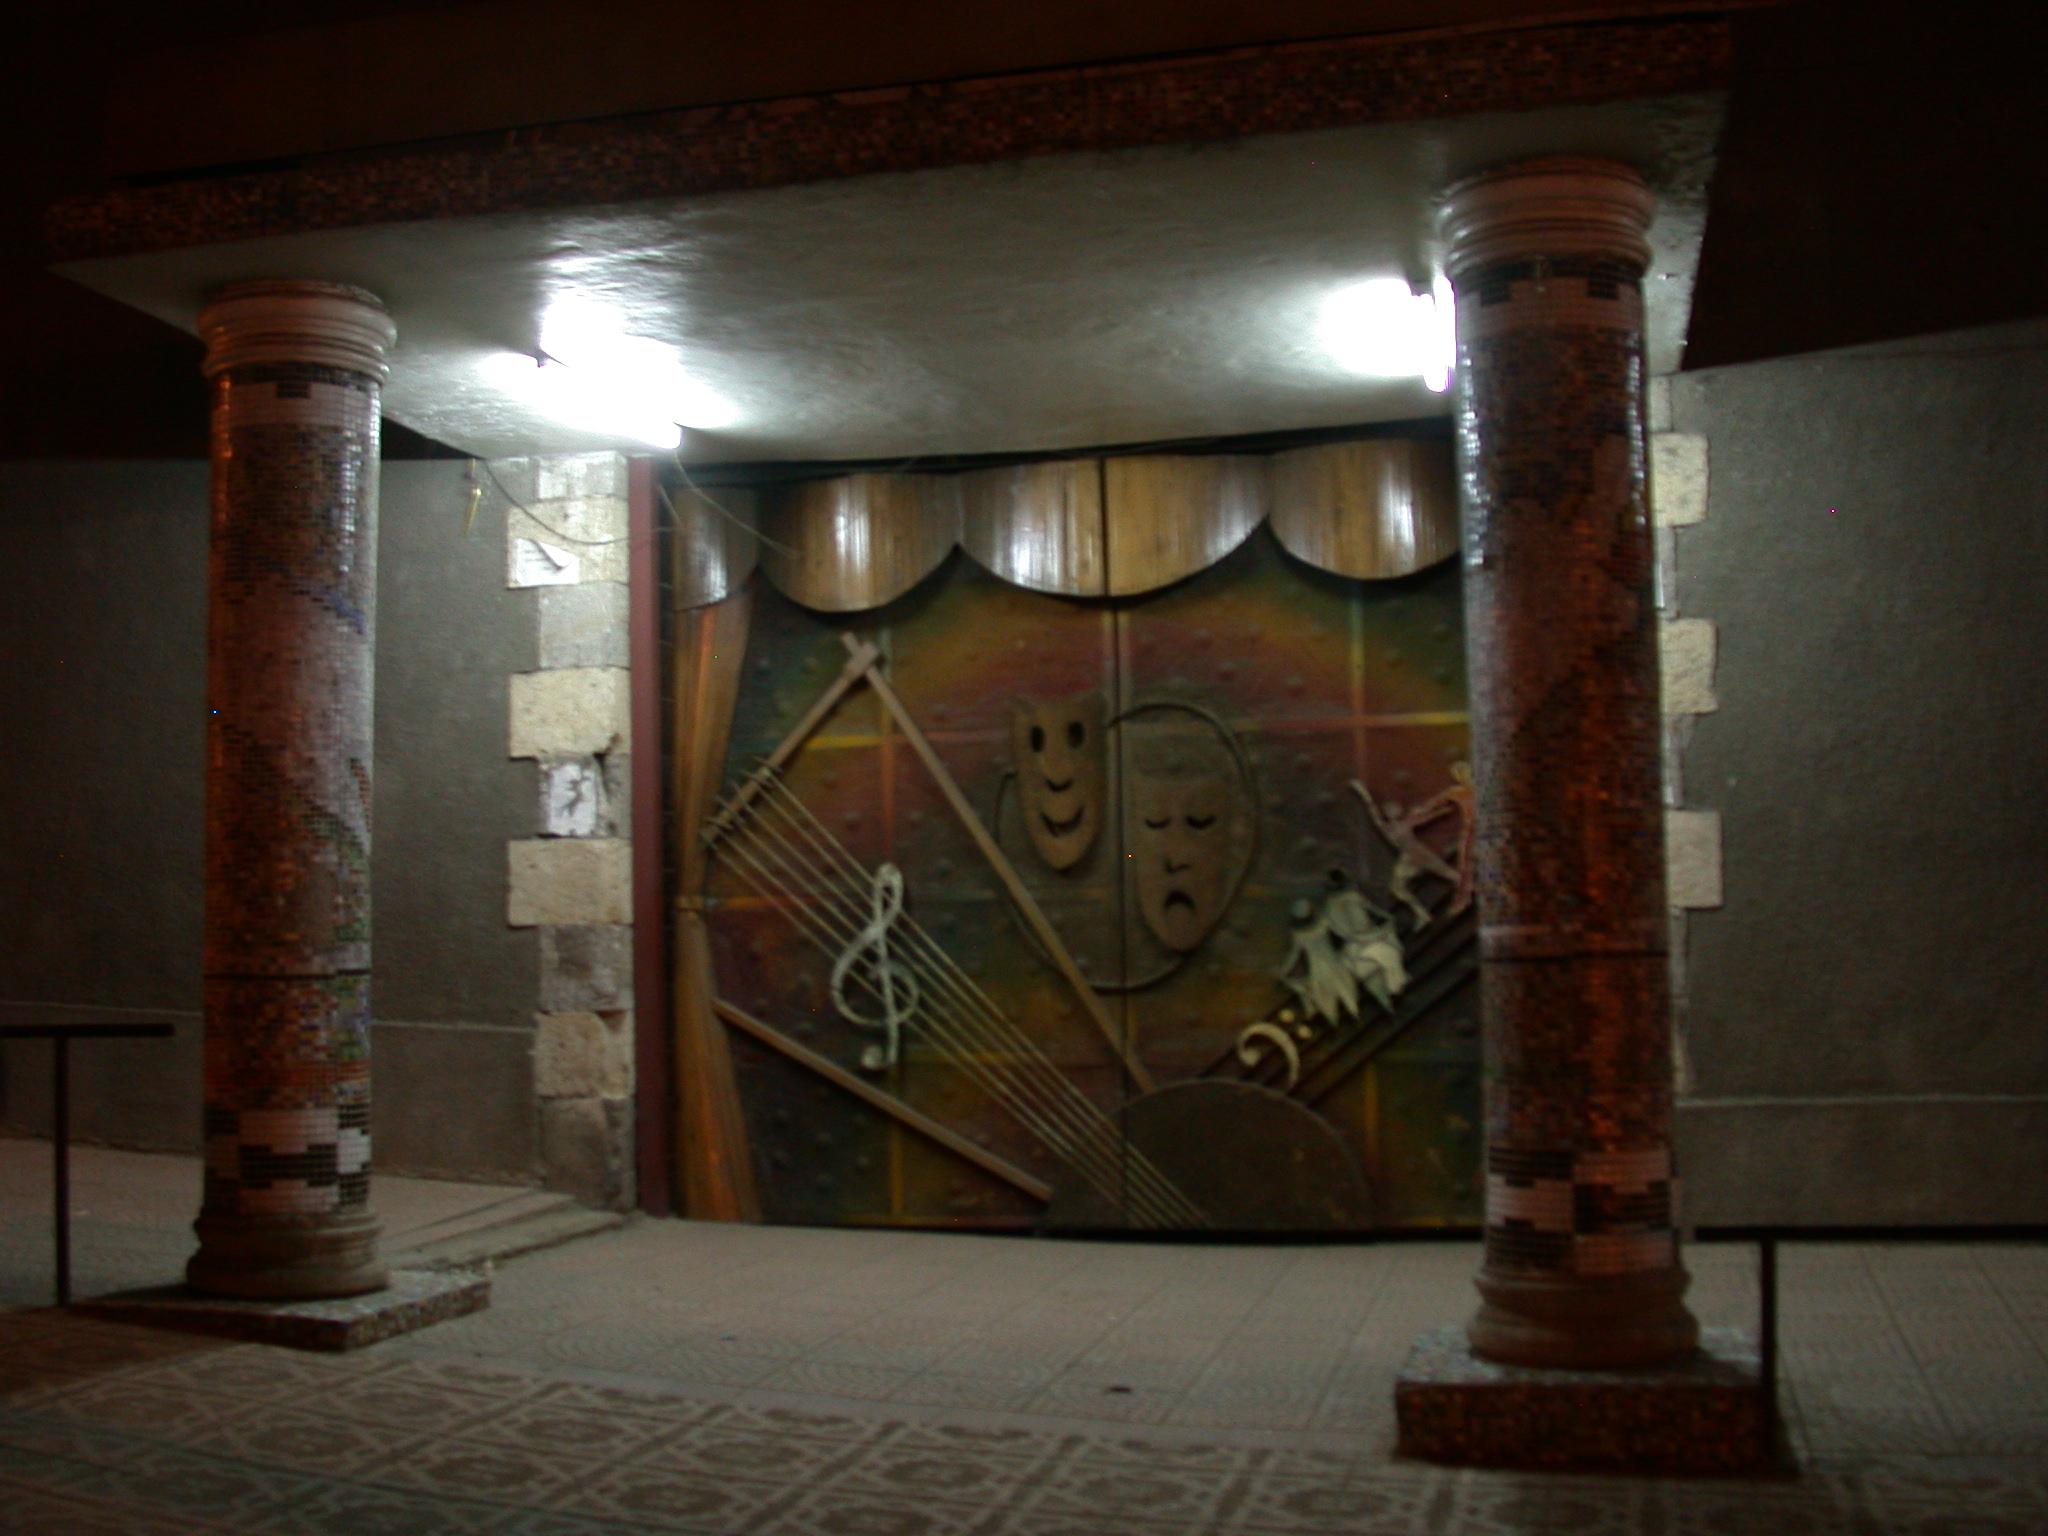 Satan Bet Theater, Addis Ababa, Ethiopia